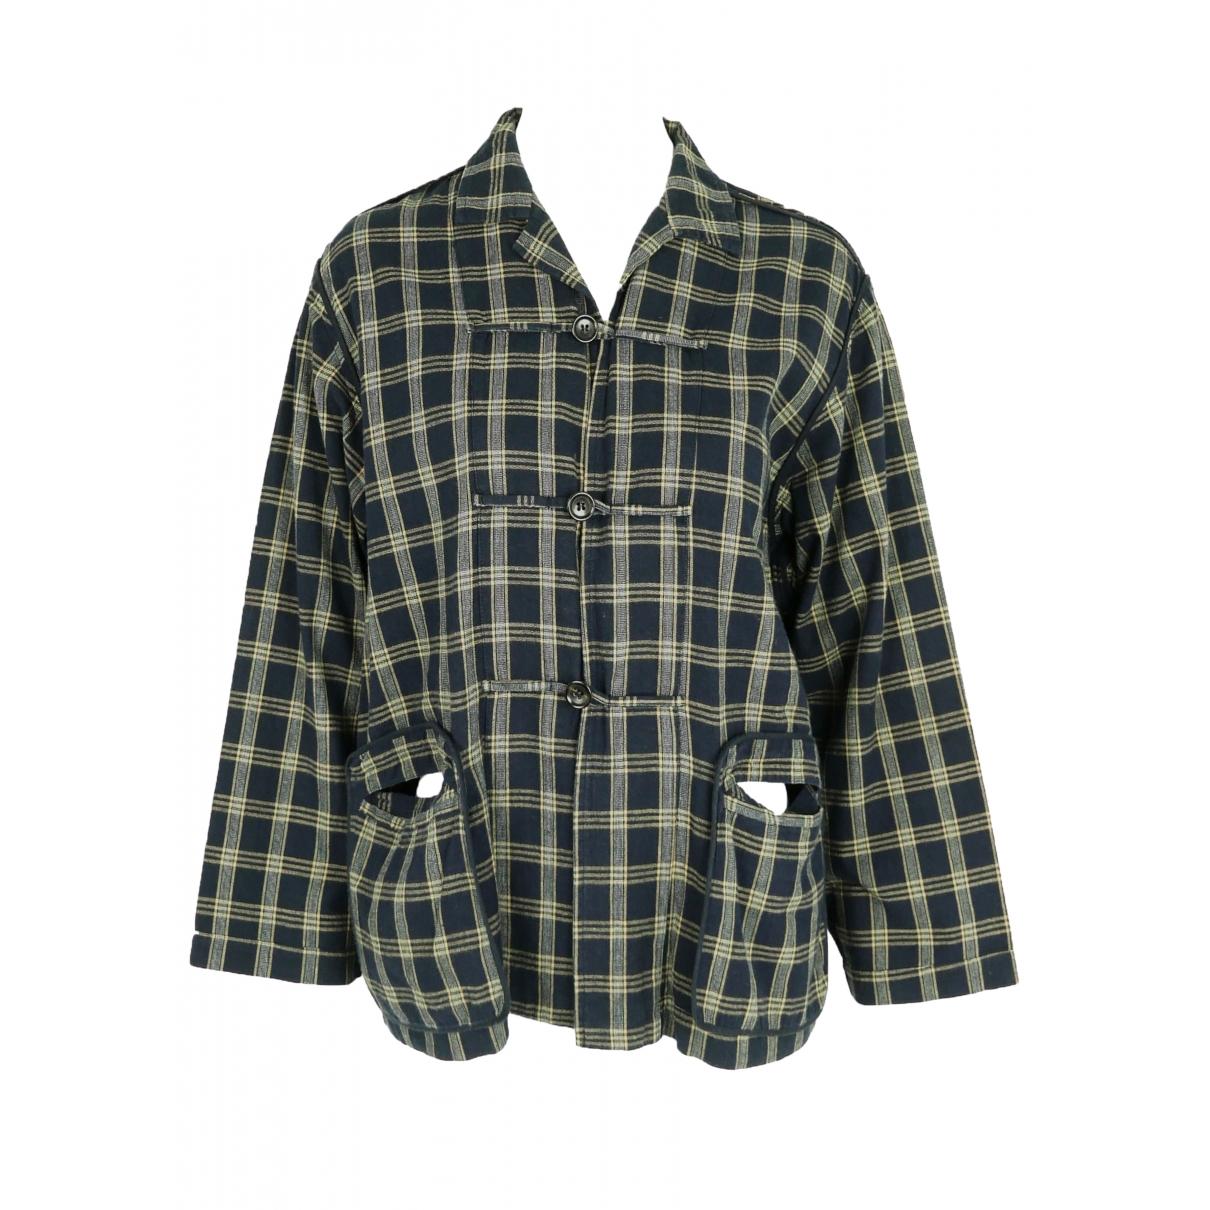 Comme Des Garcons \N Navy Cotton jacket for Women M International